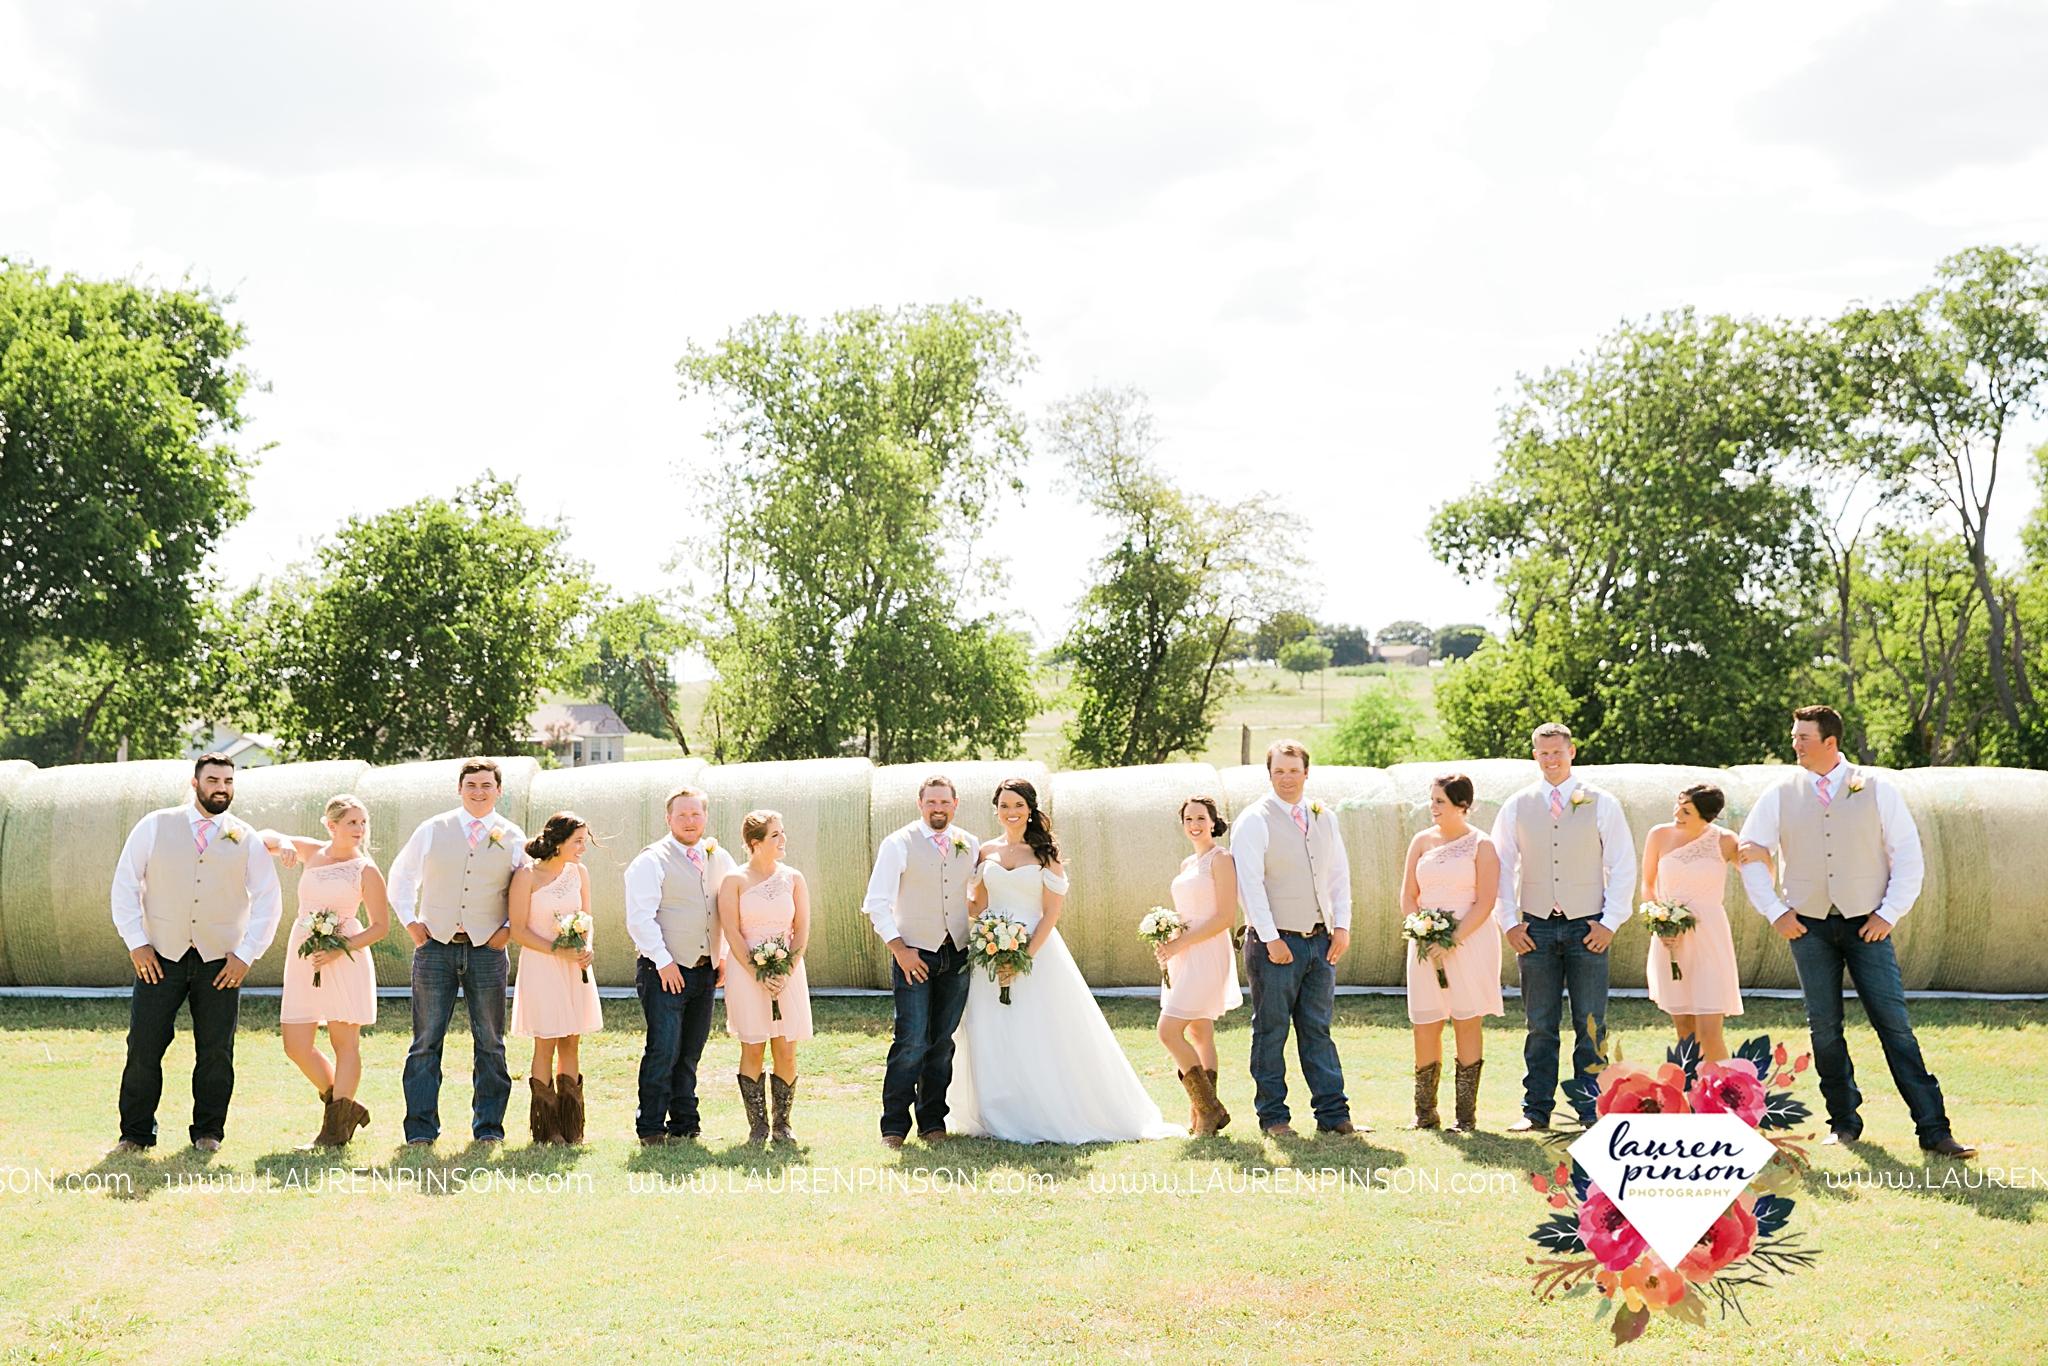 jones-barn-willow-creek-ranch-wedding-in-cleburne-texas-fort-worth-dfw-wichita-falls-wedding-photography_3219.jpg